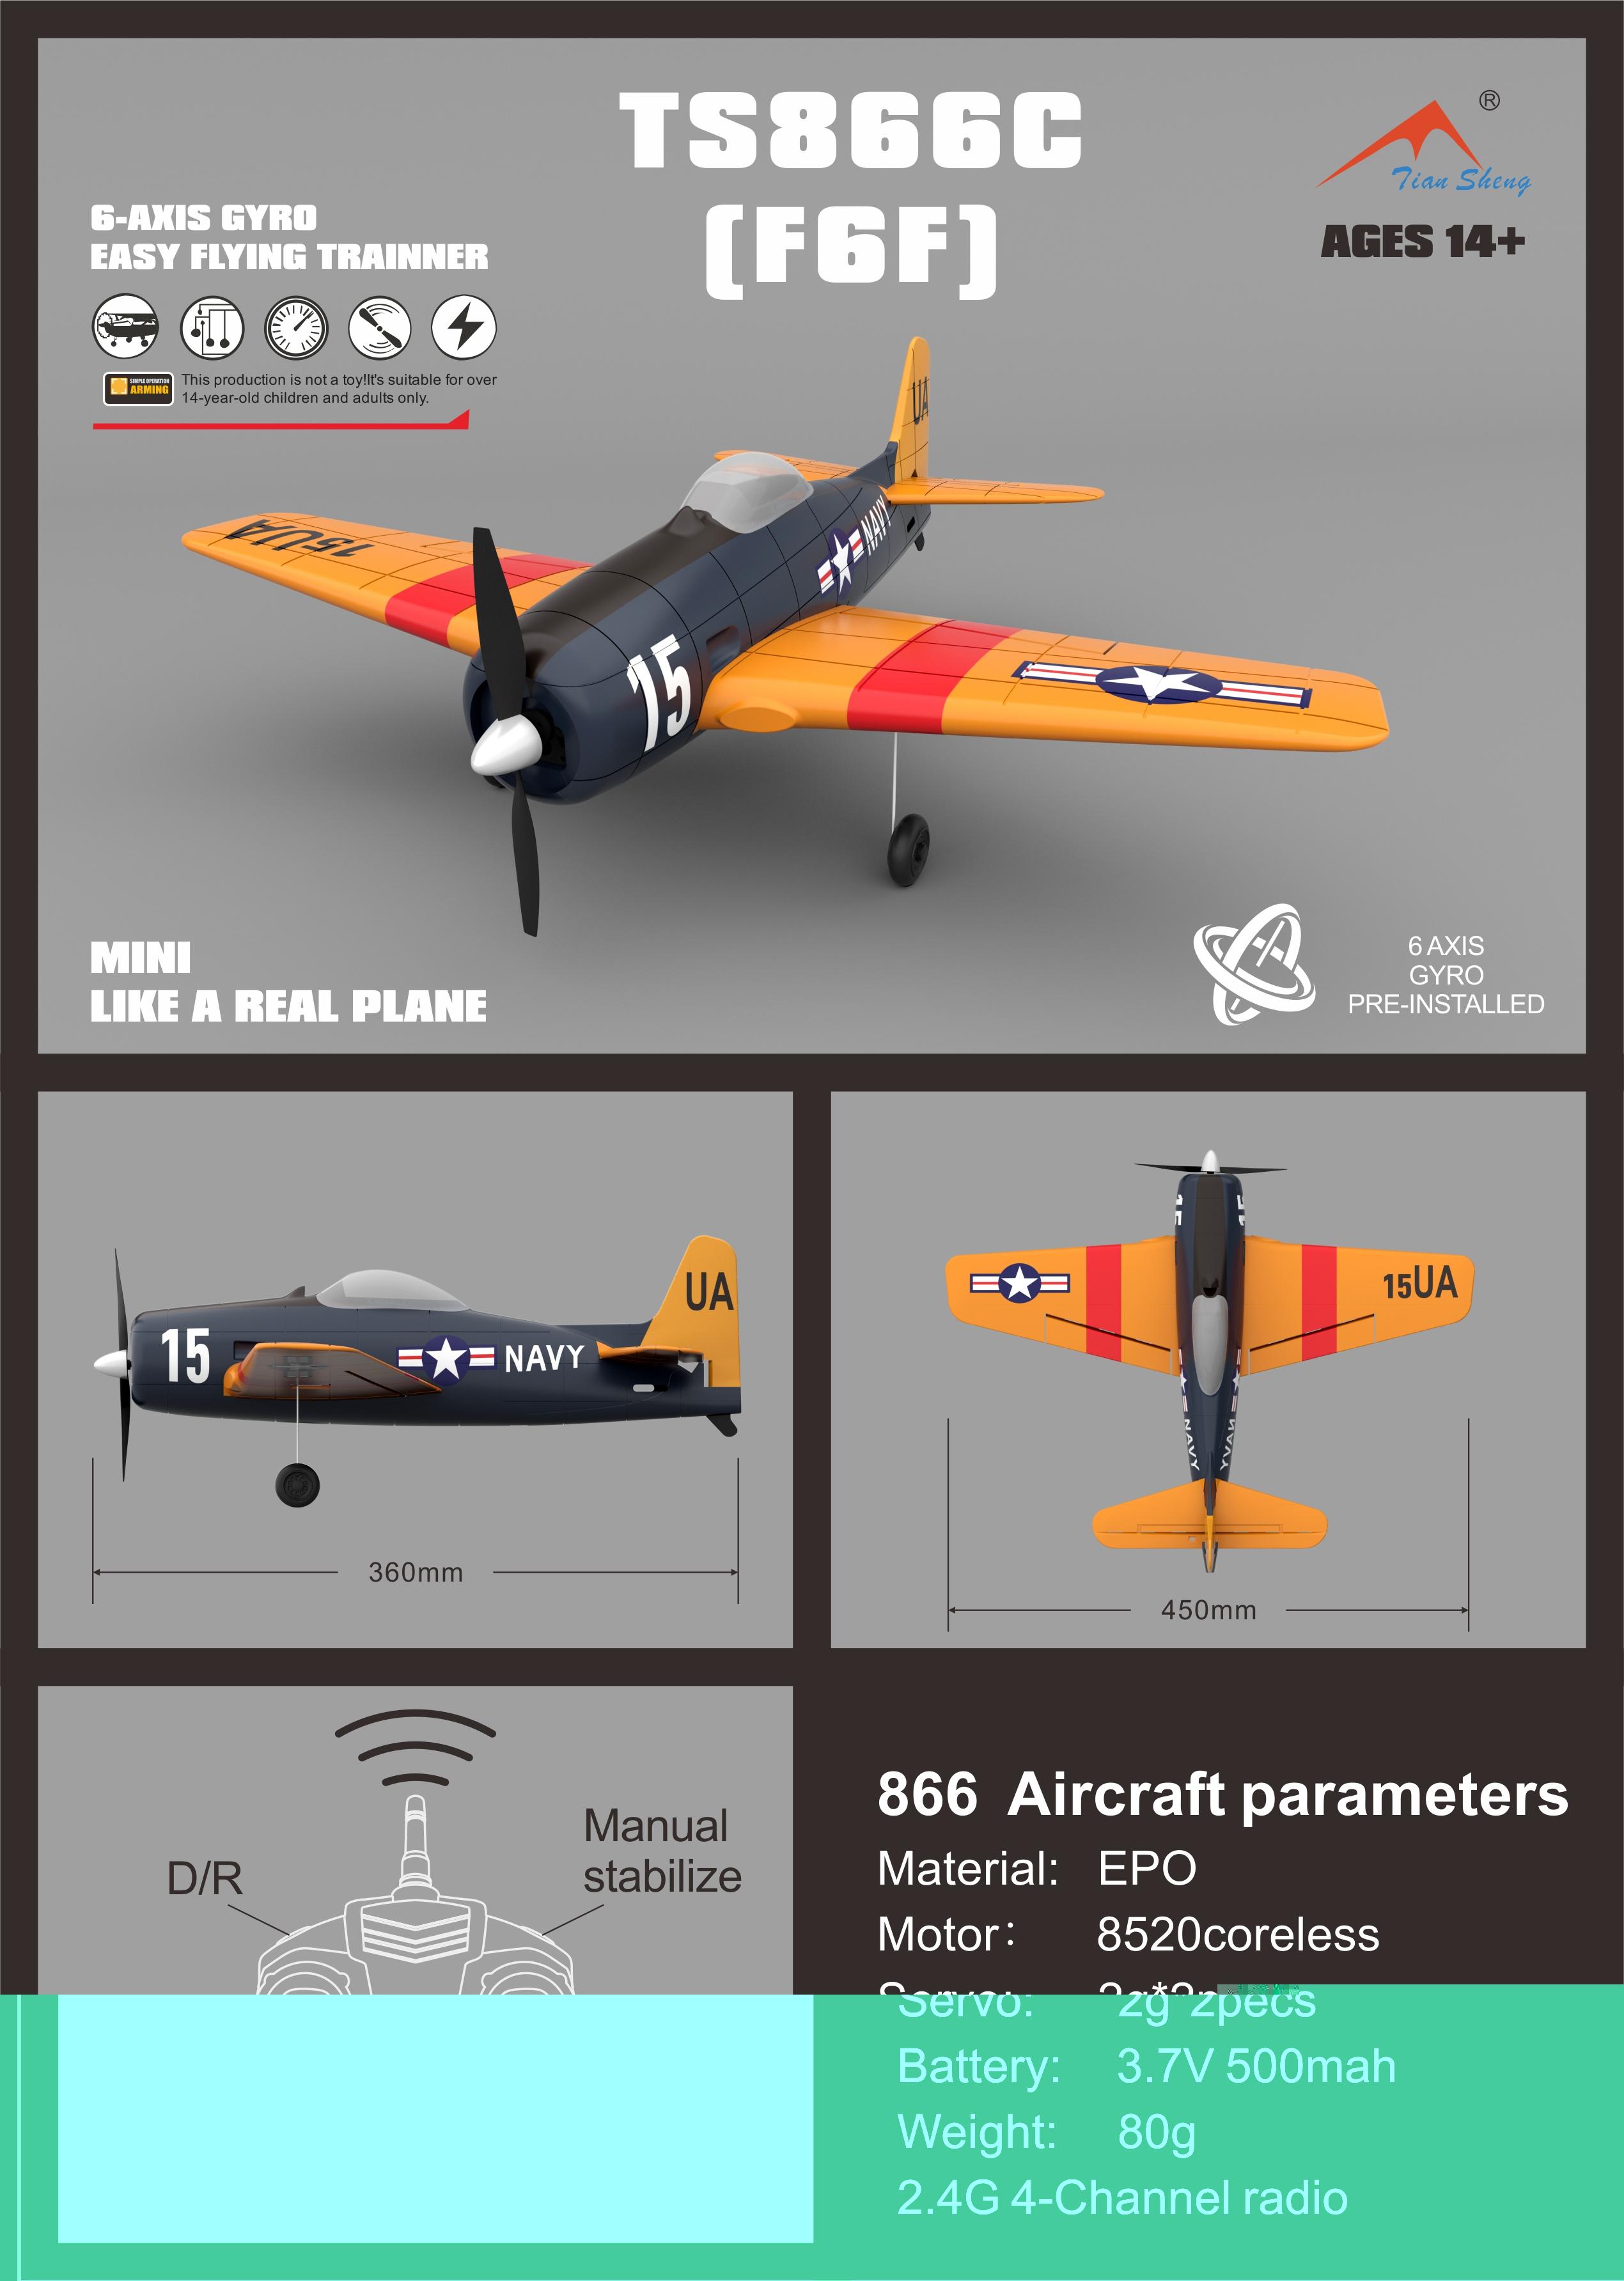 1/36 Scale Model Mini RC Aircraft, Grumman F6F Hellcat Fighters Remote Control Airplane.